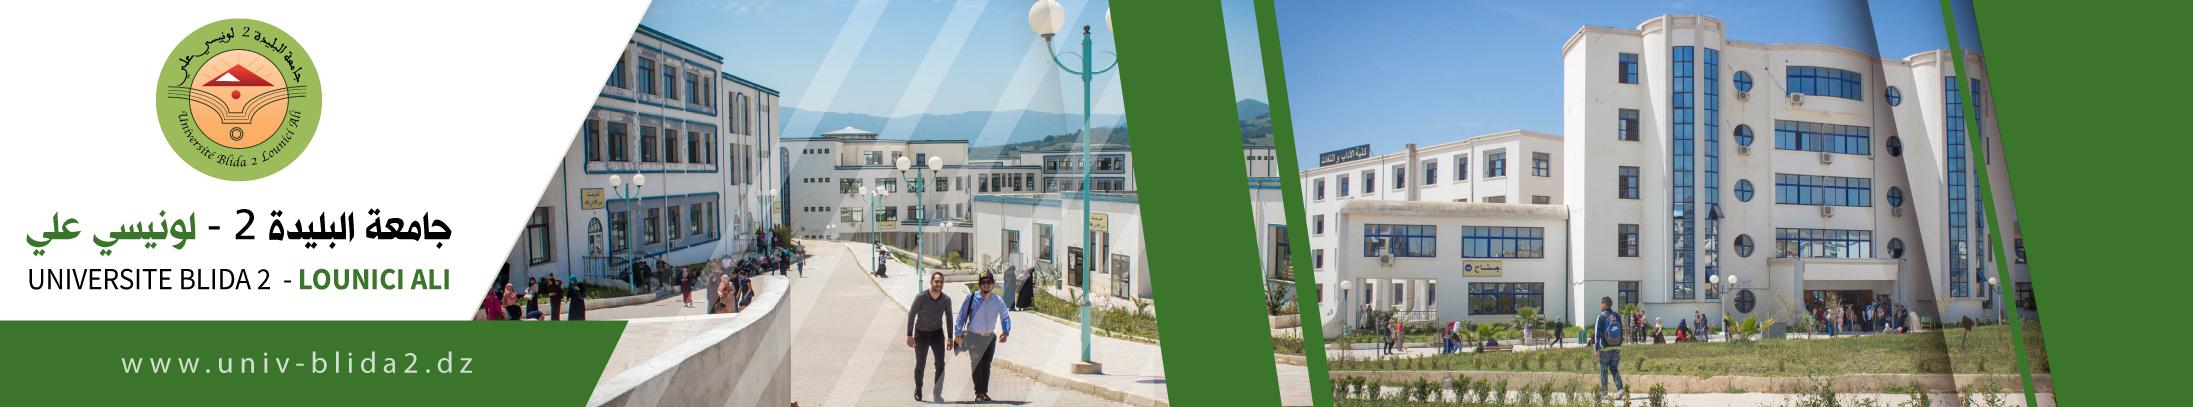 Blida 2 university